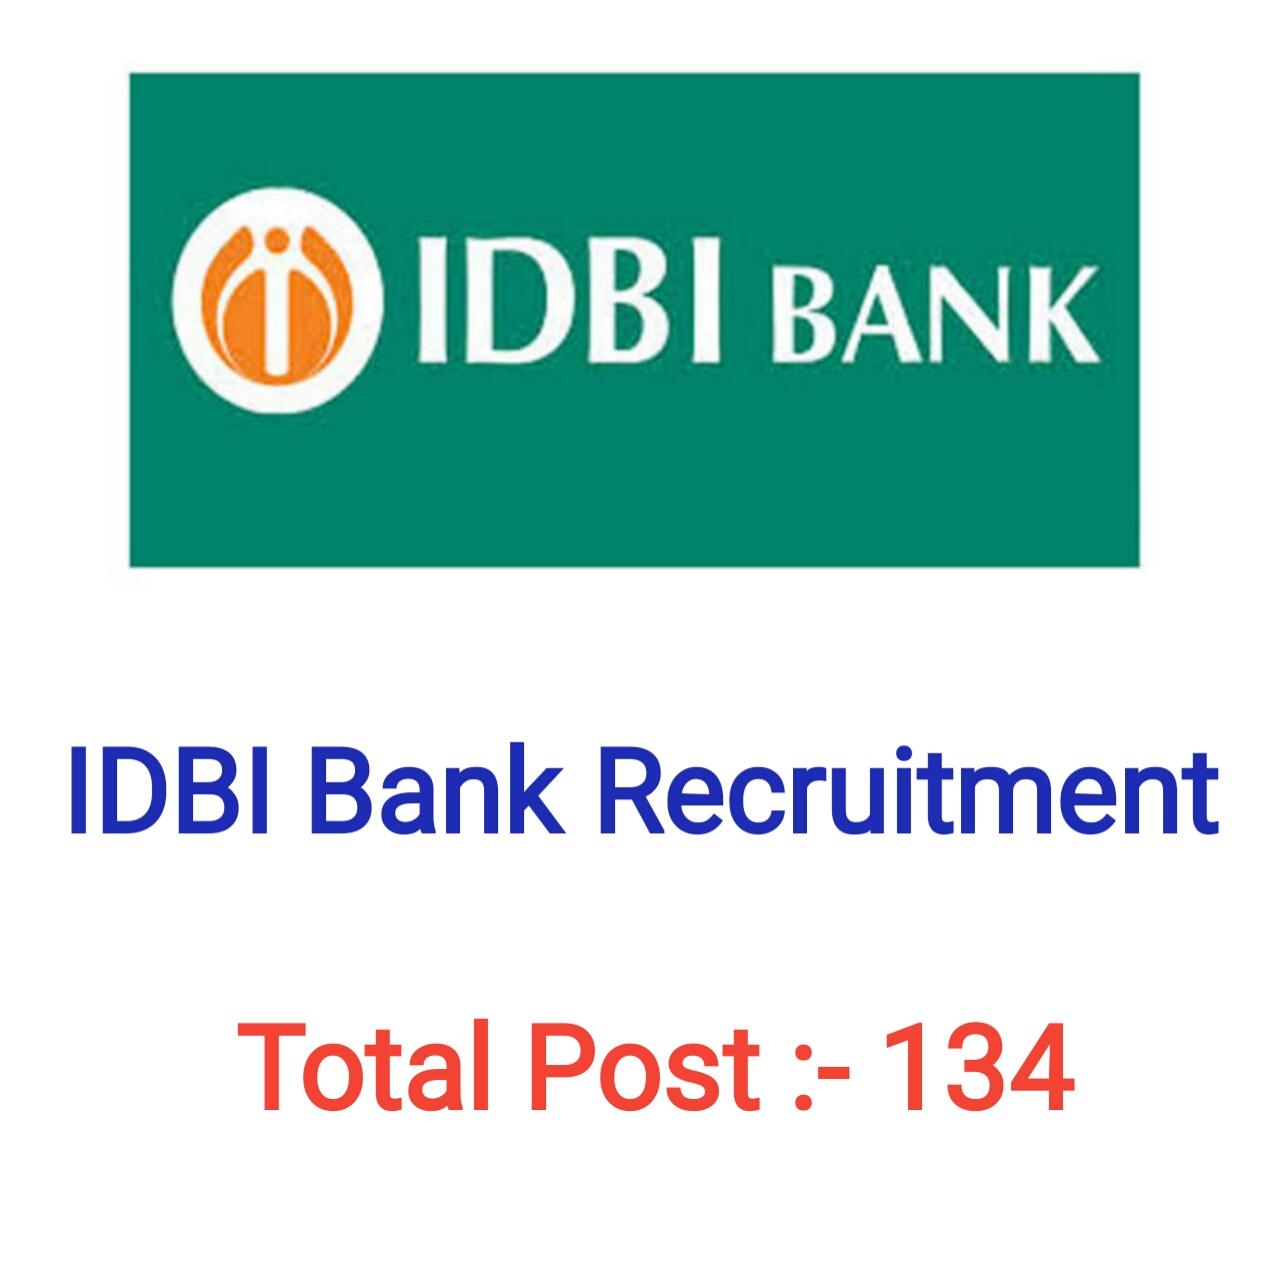 IDBI BANK RECRUITMENT FOR 134 POSTS / IDBI BANK JOB